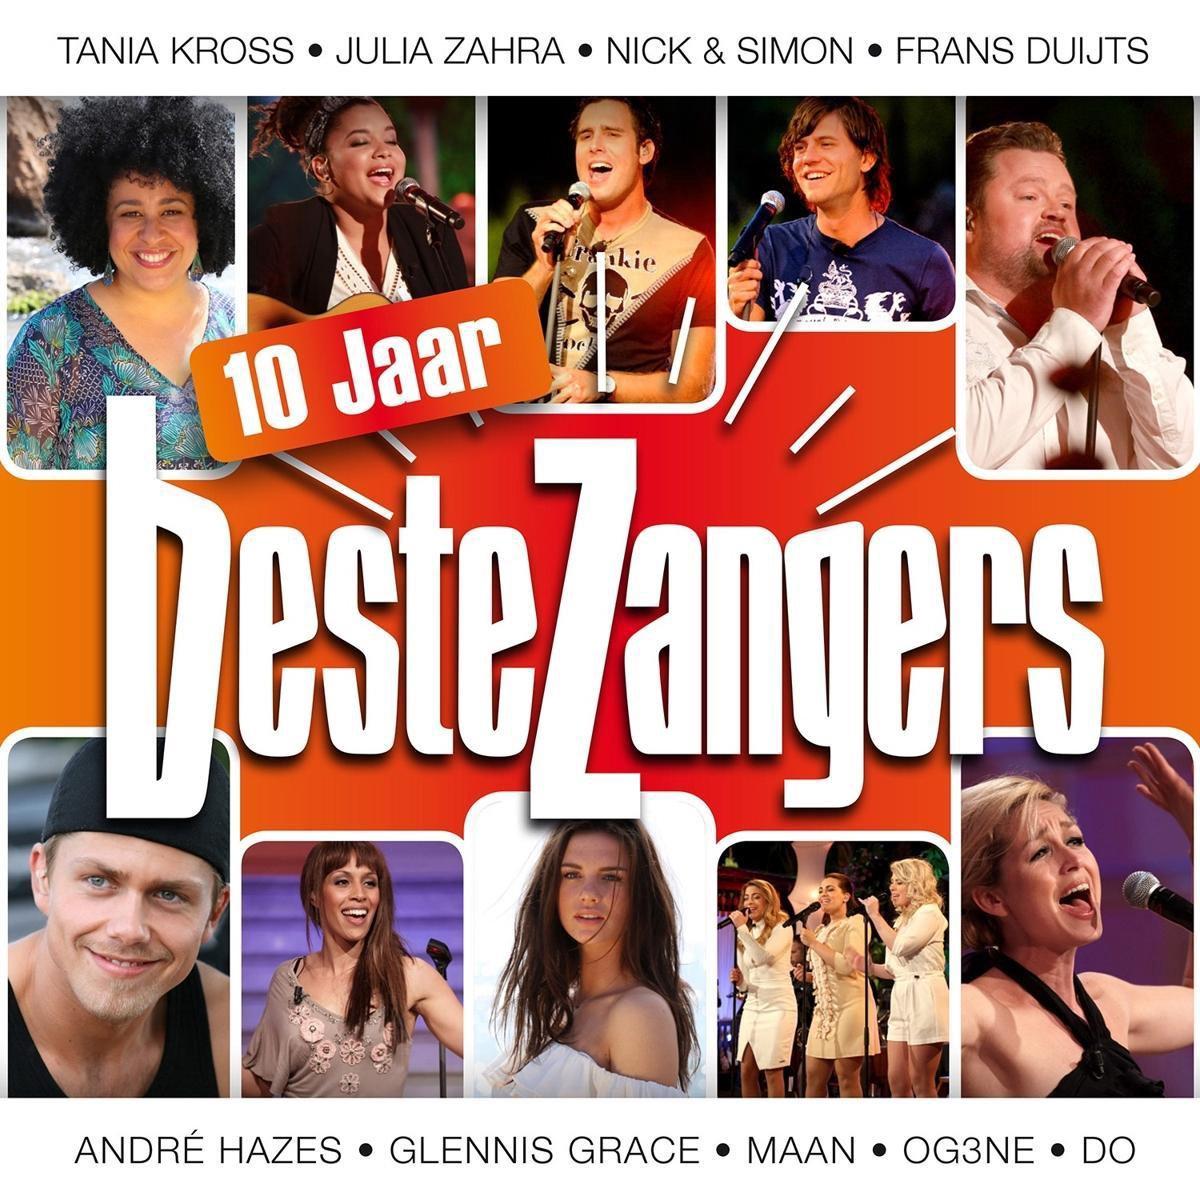 Beste Zangers 10 Jaar - De Beste Zangers